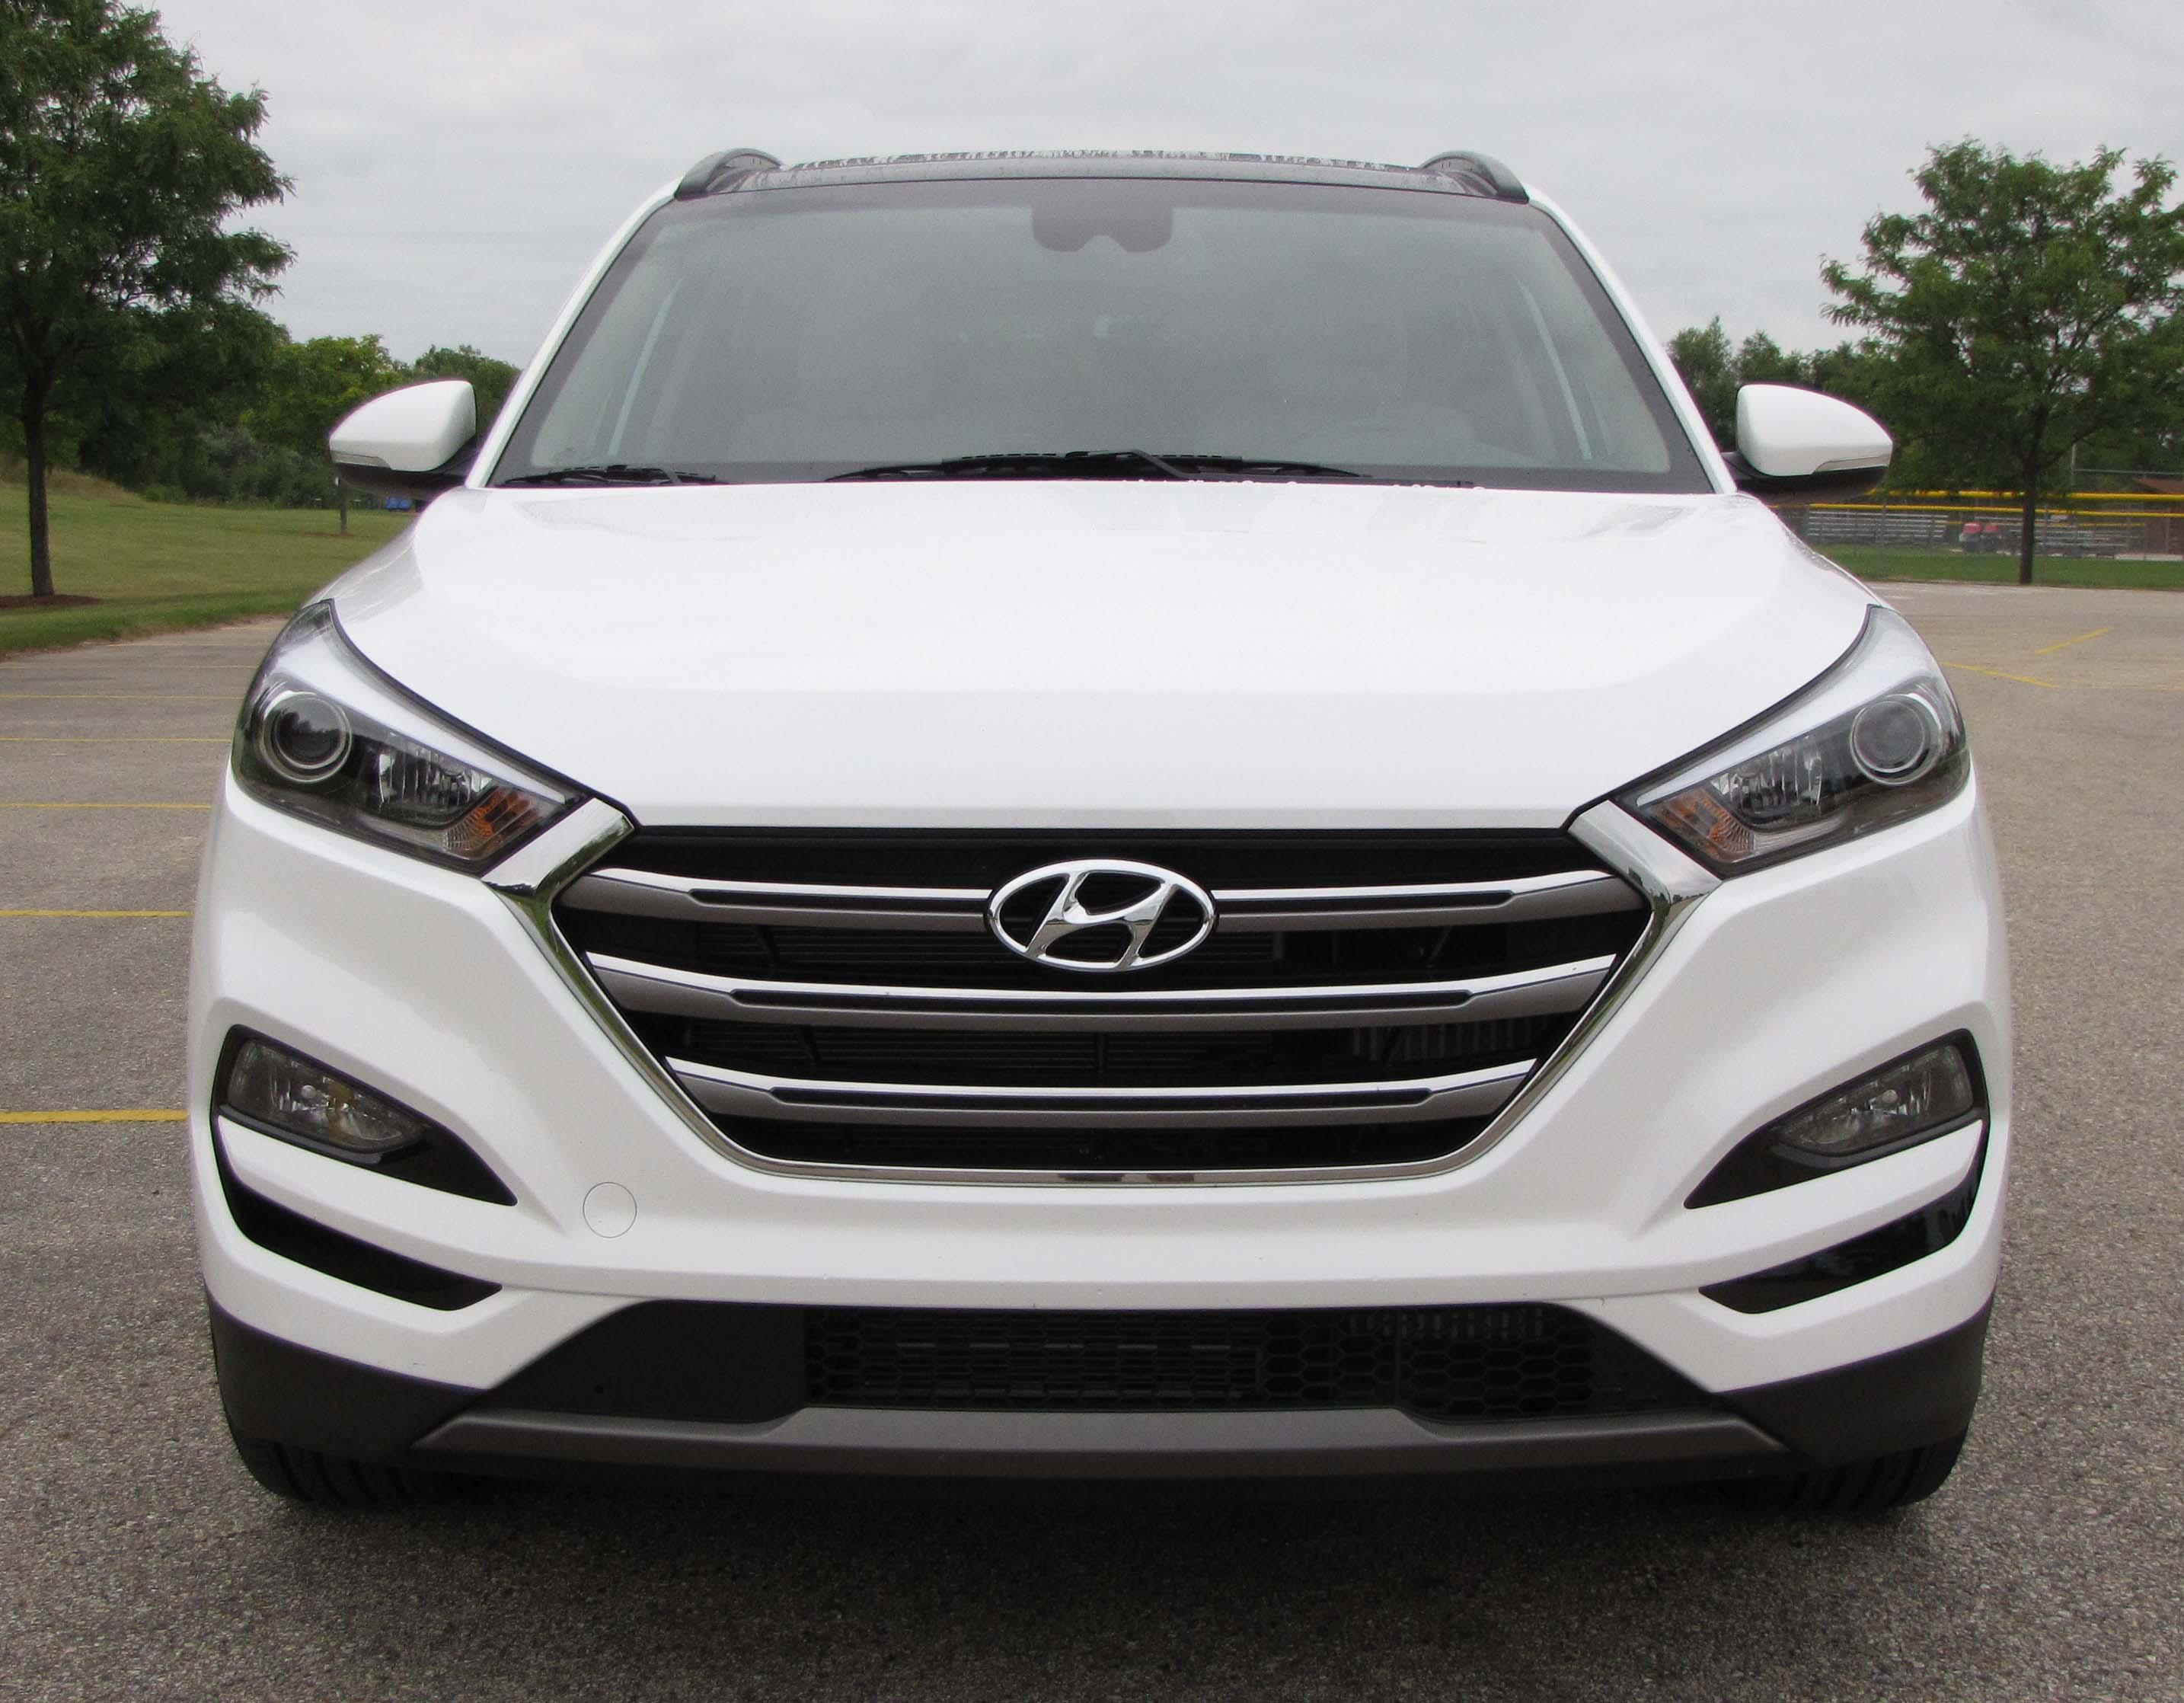 news off practical new left car all motoring up tucson hyundai where picks